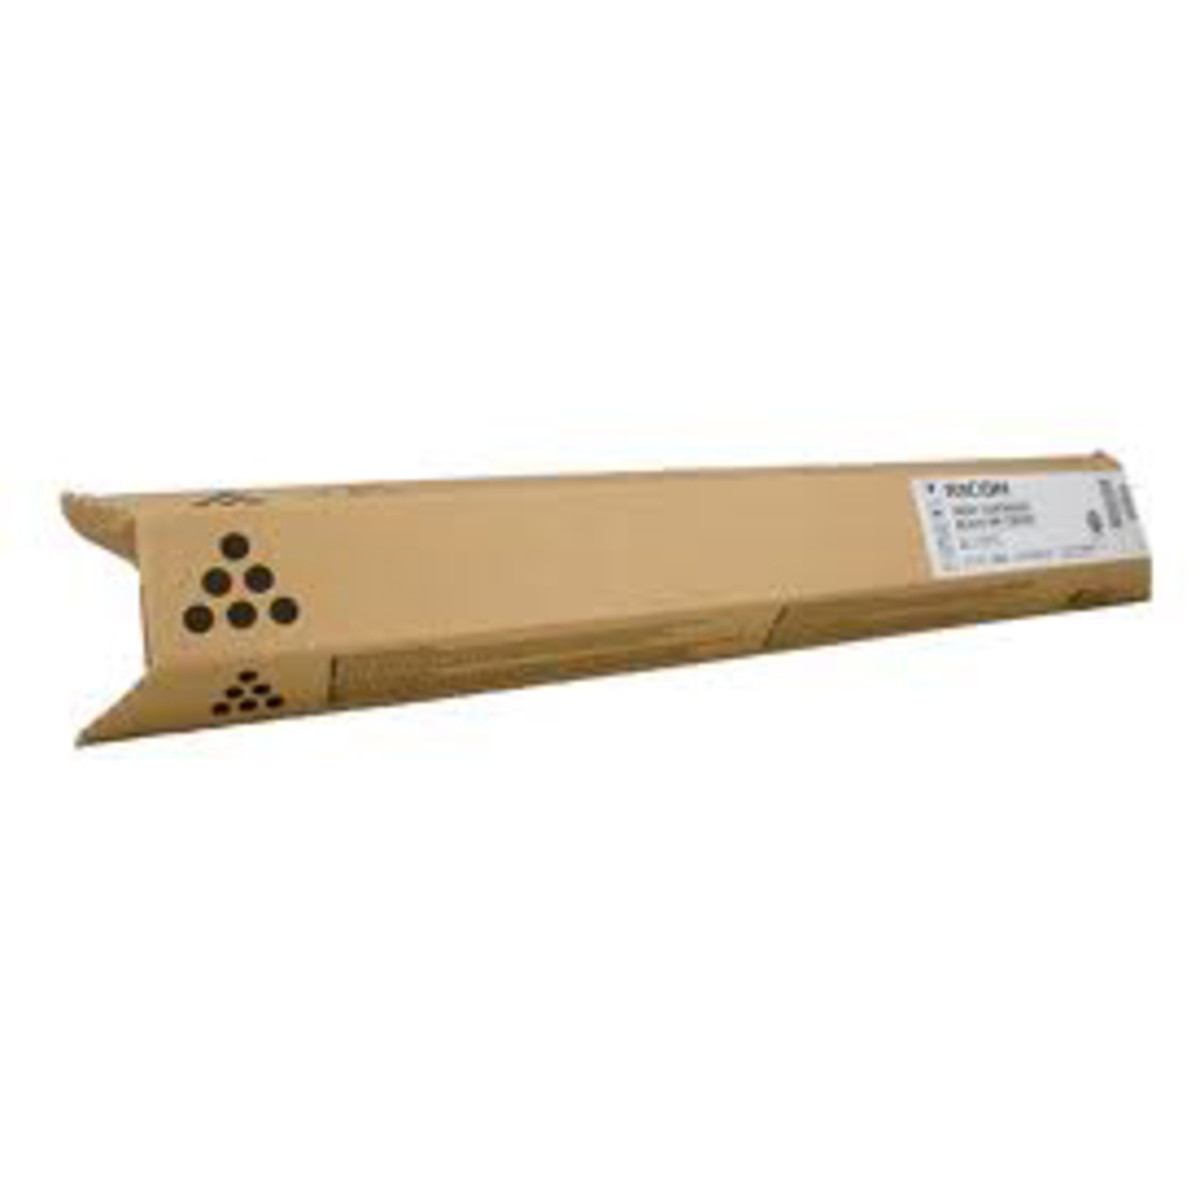 Ricoh 888-642 Magenta Toner Cartridge